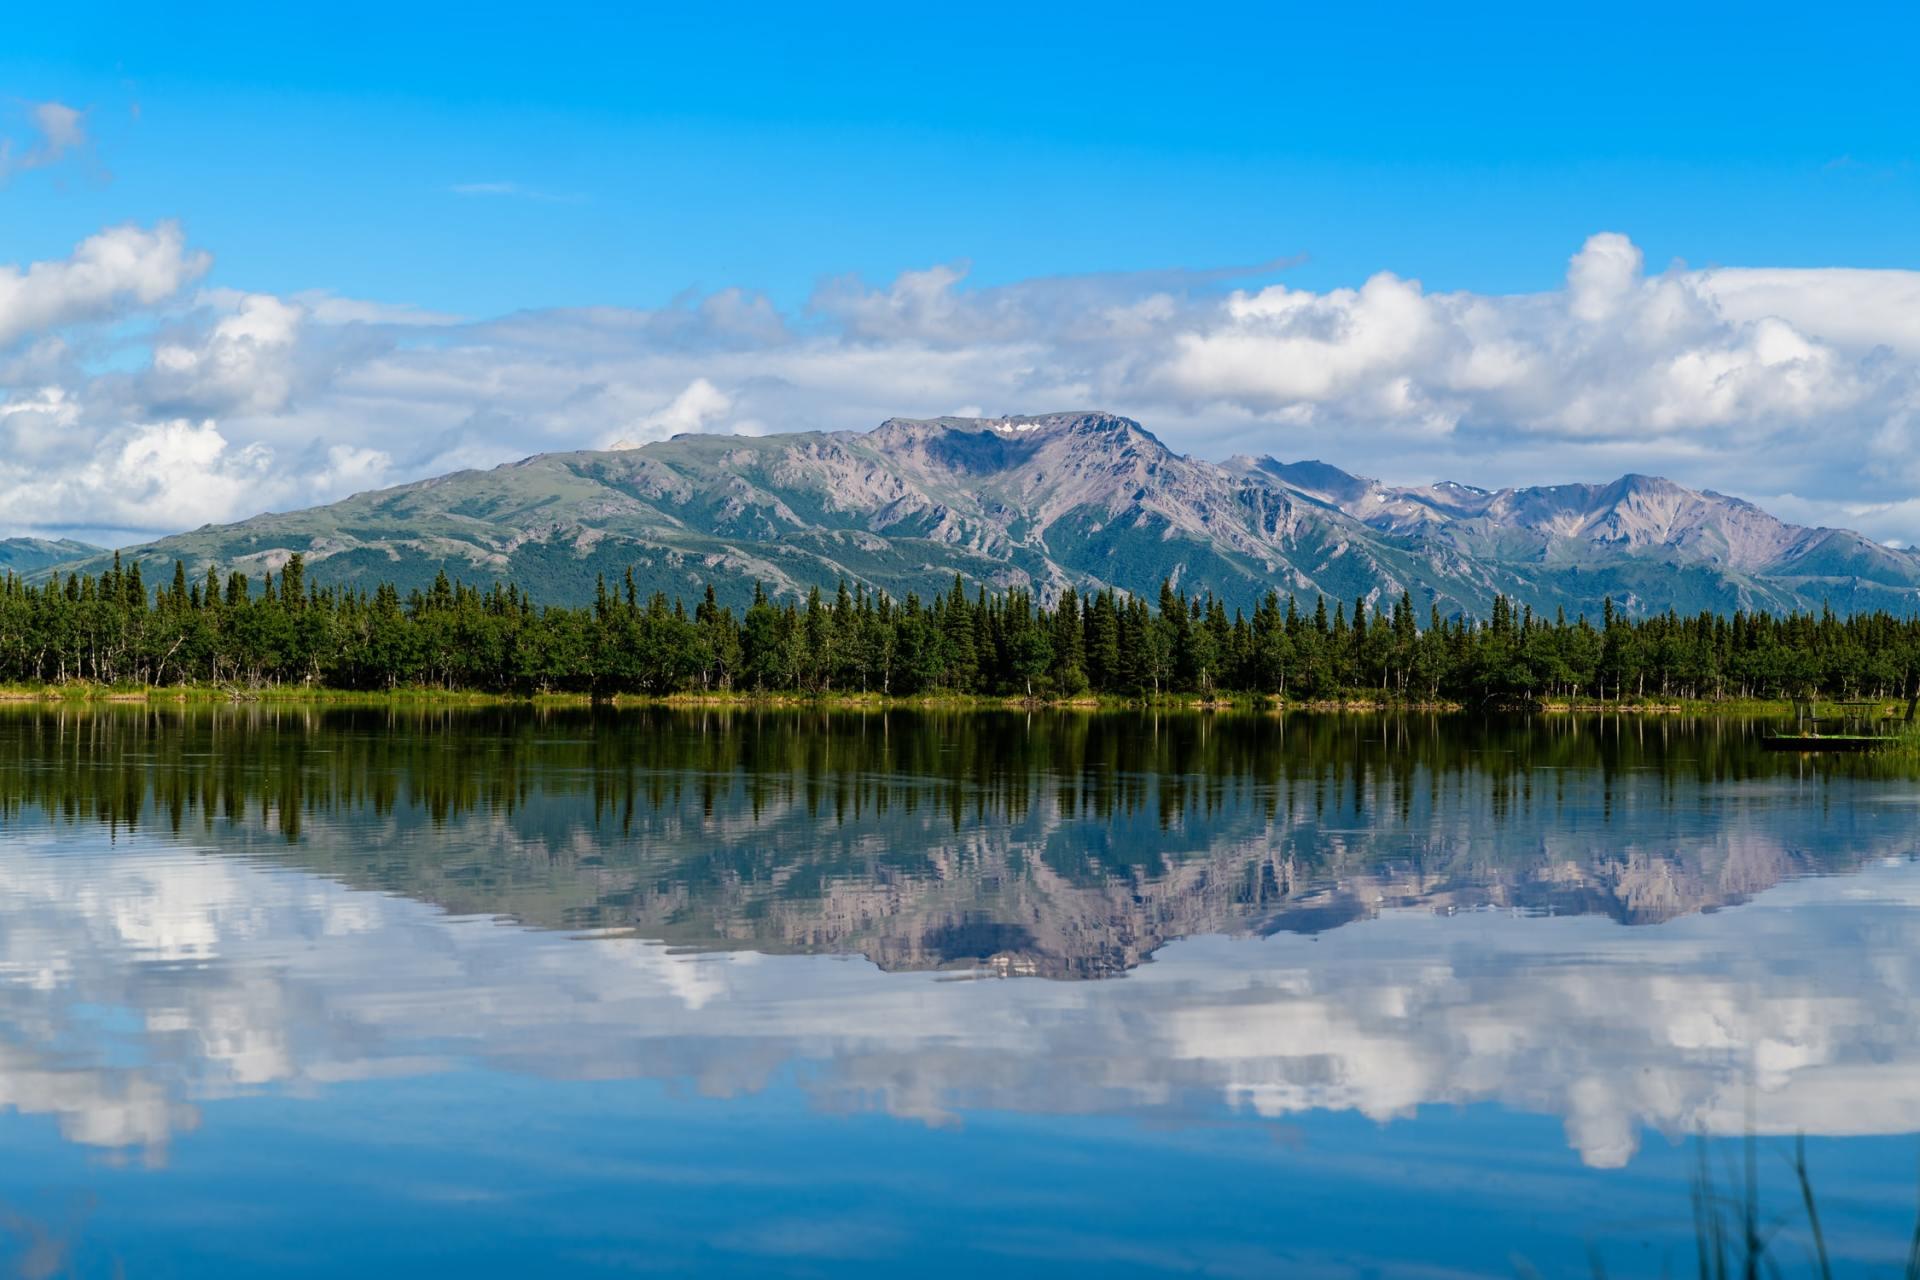 Alaska mountain reflection mirrored in lake